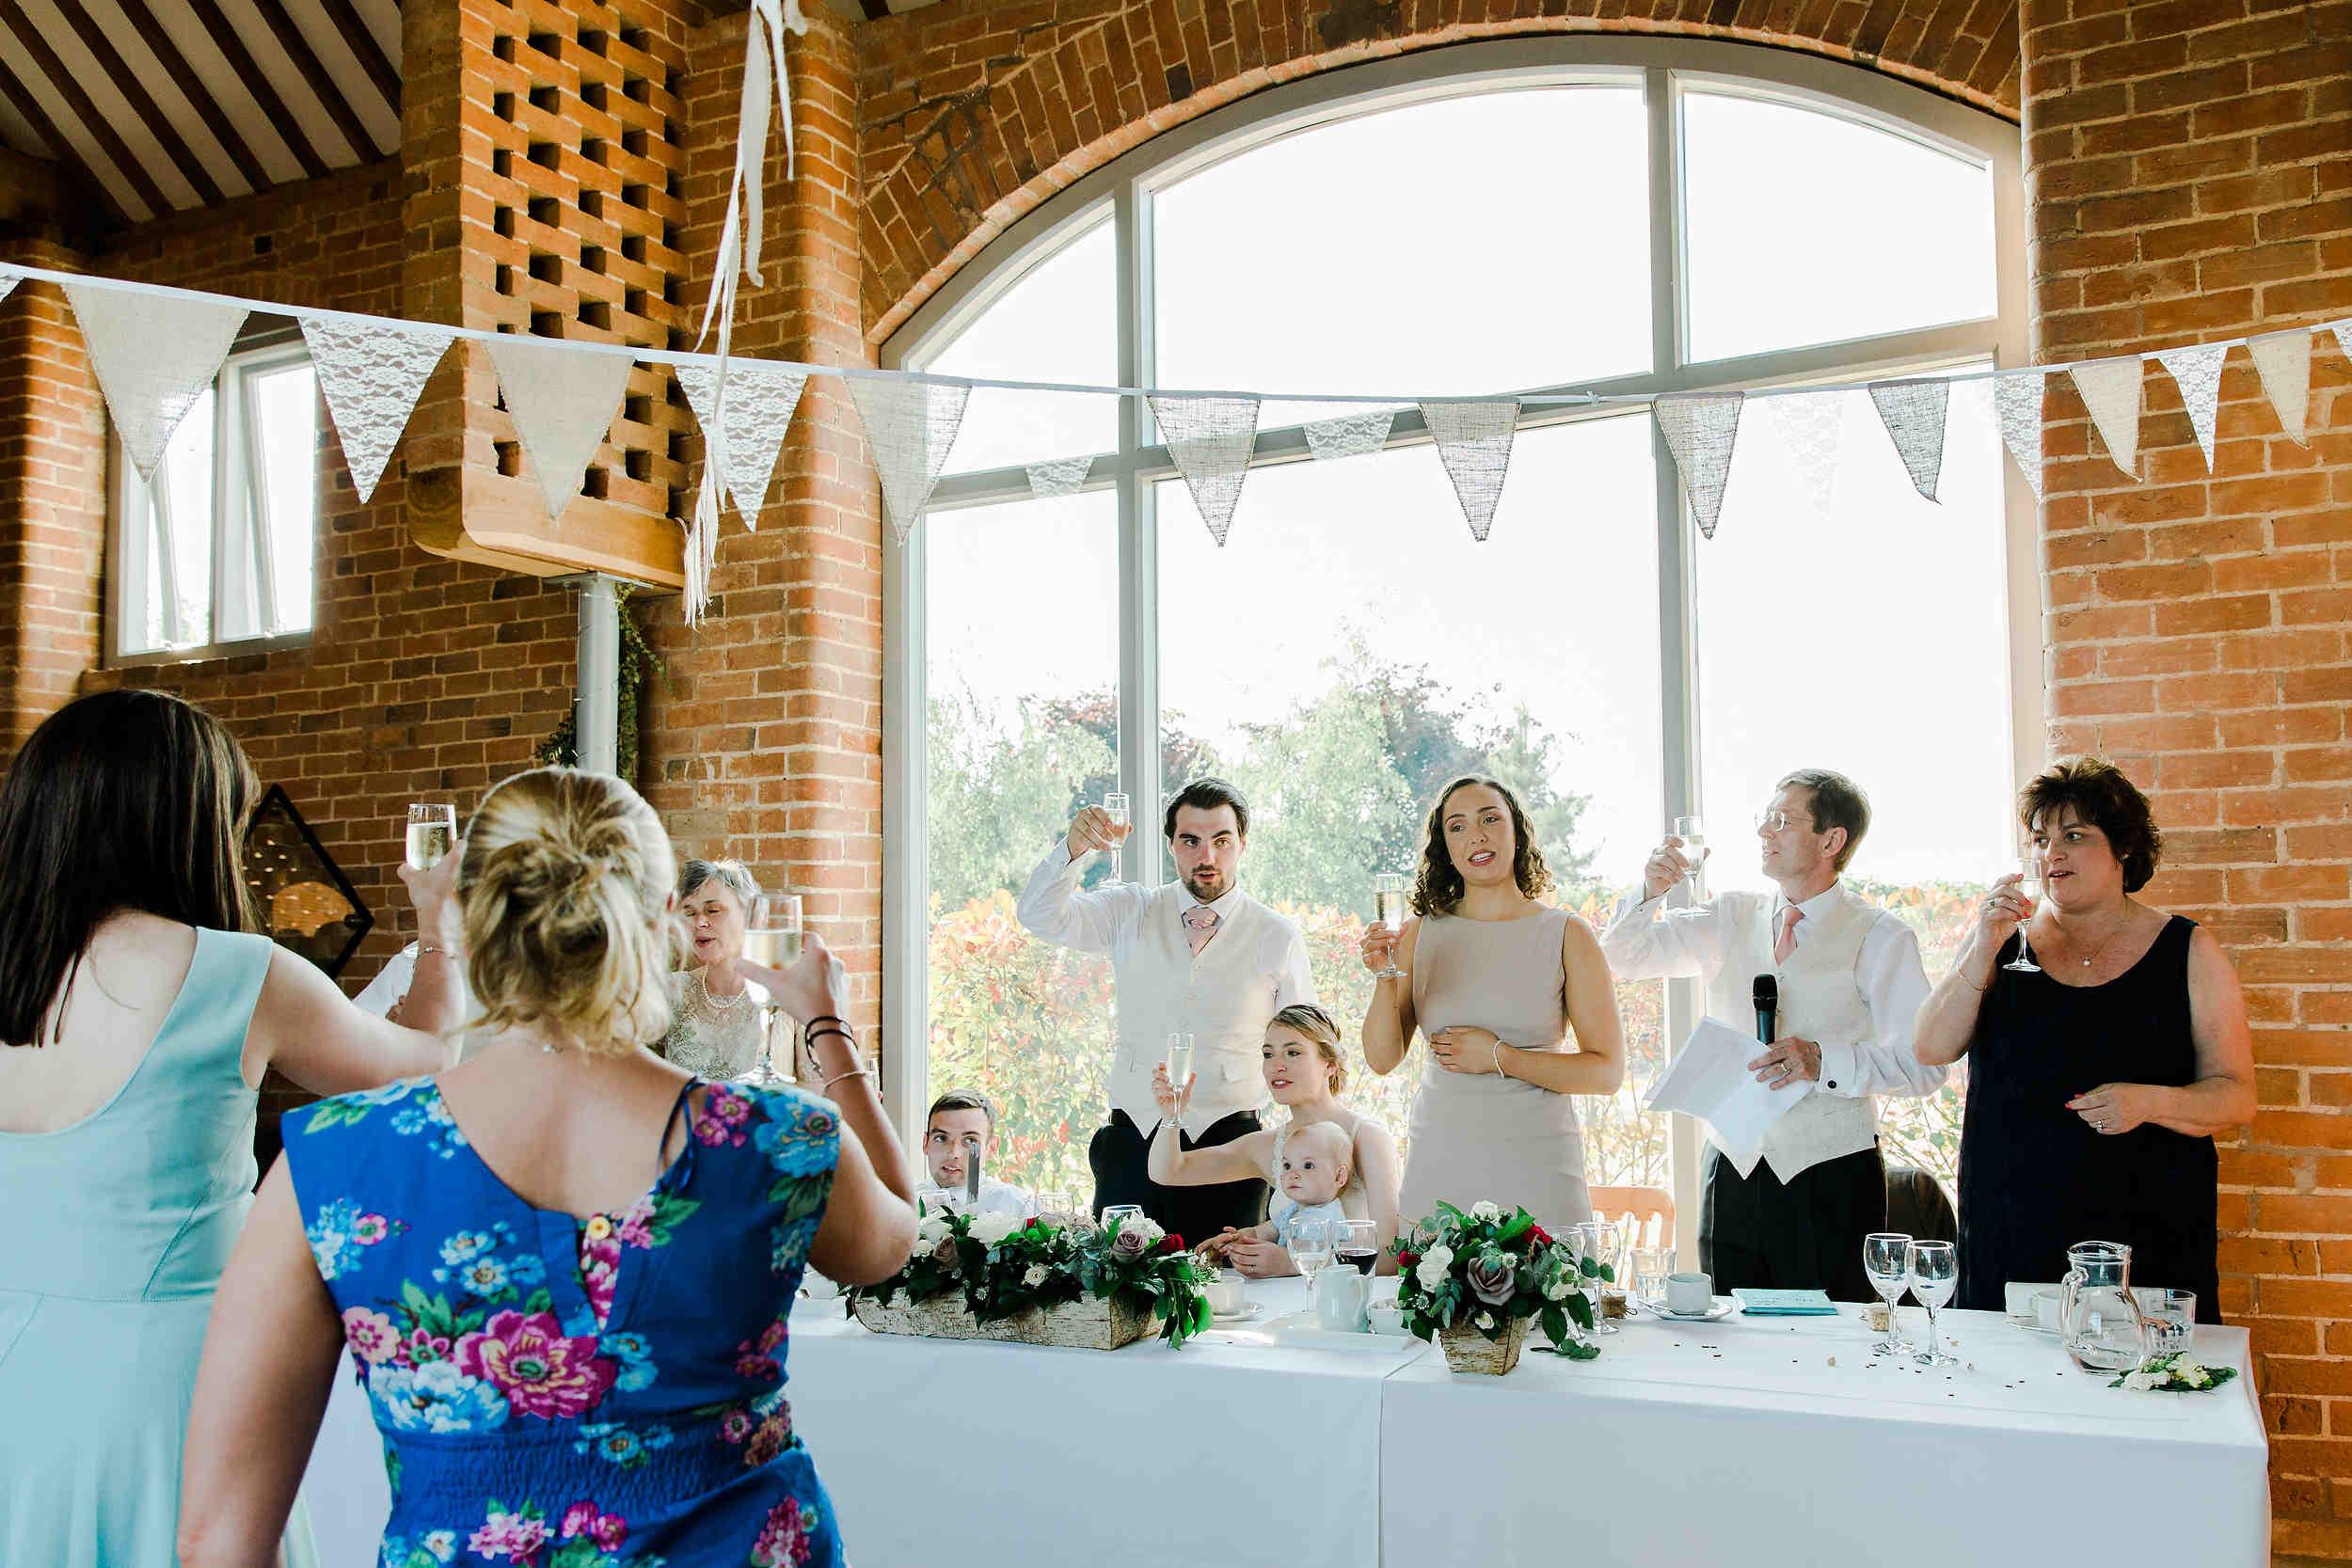 Modern_Stylish_Wedding_at_Swallows_Nest_Barn1247